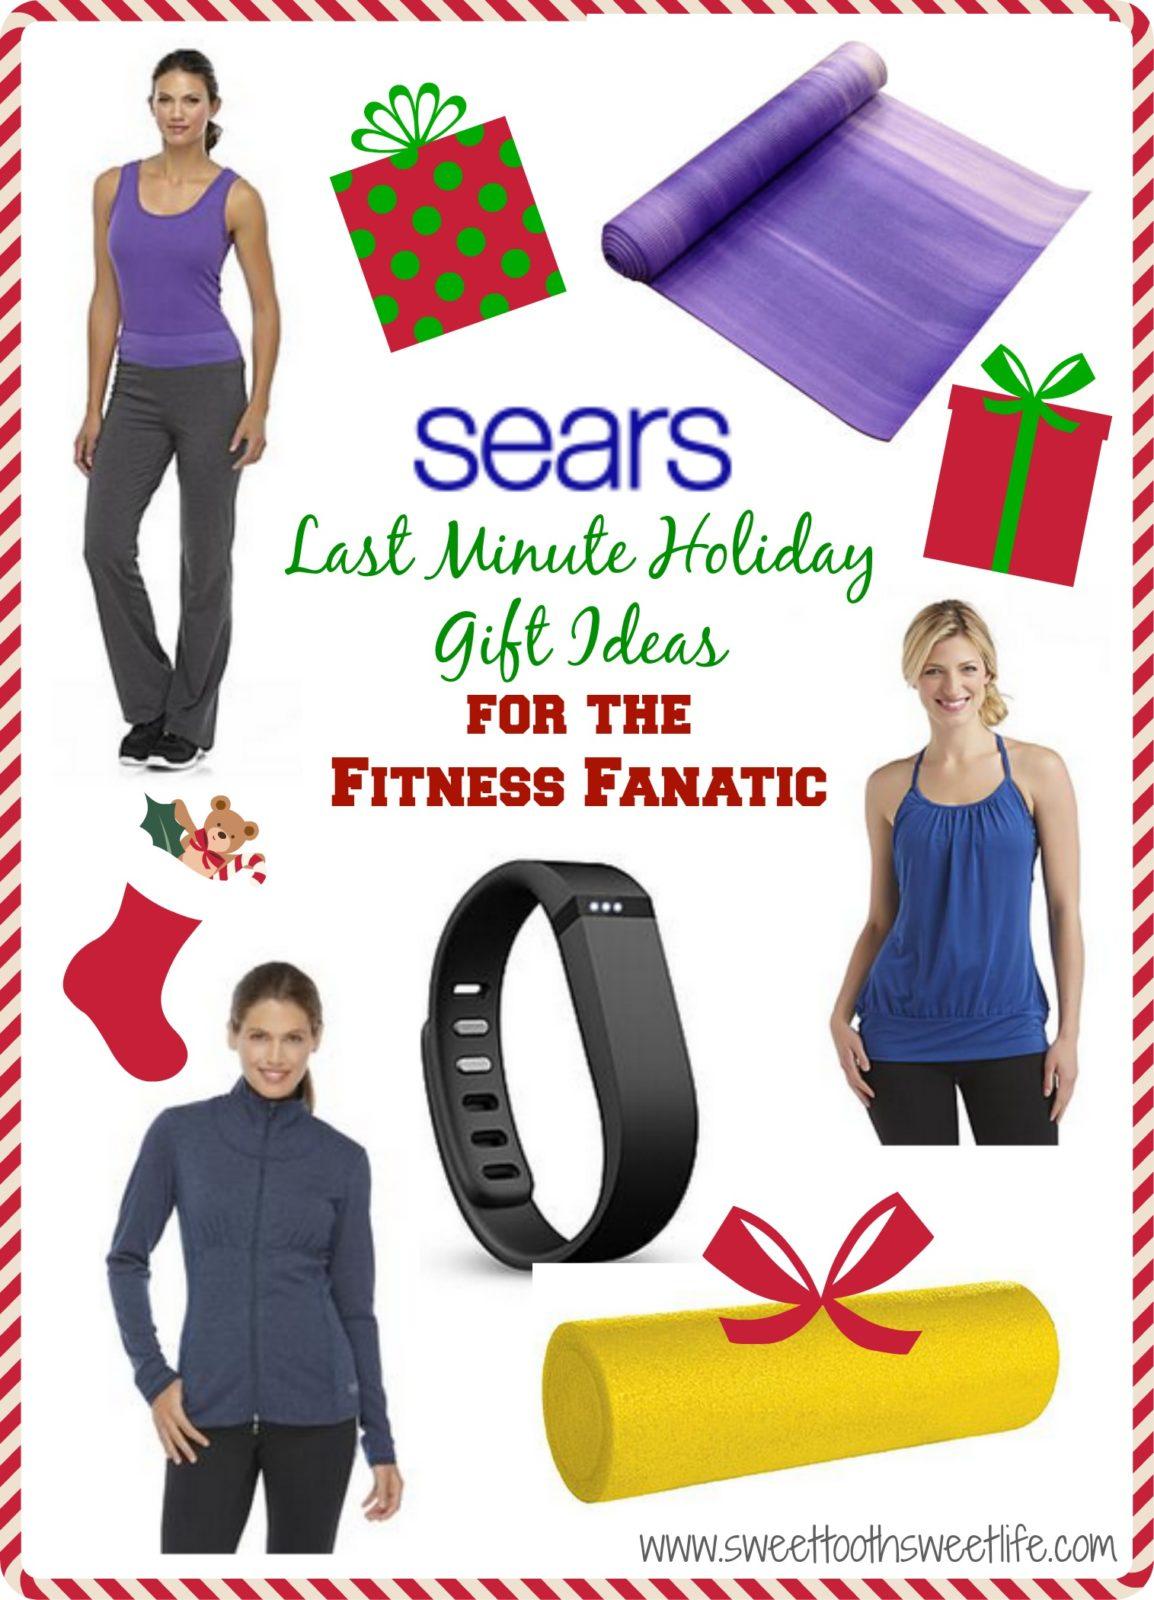 sears gifts